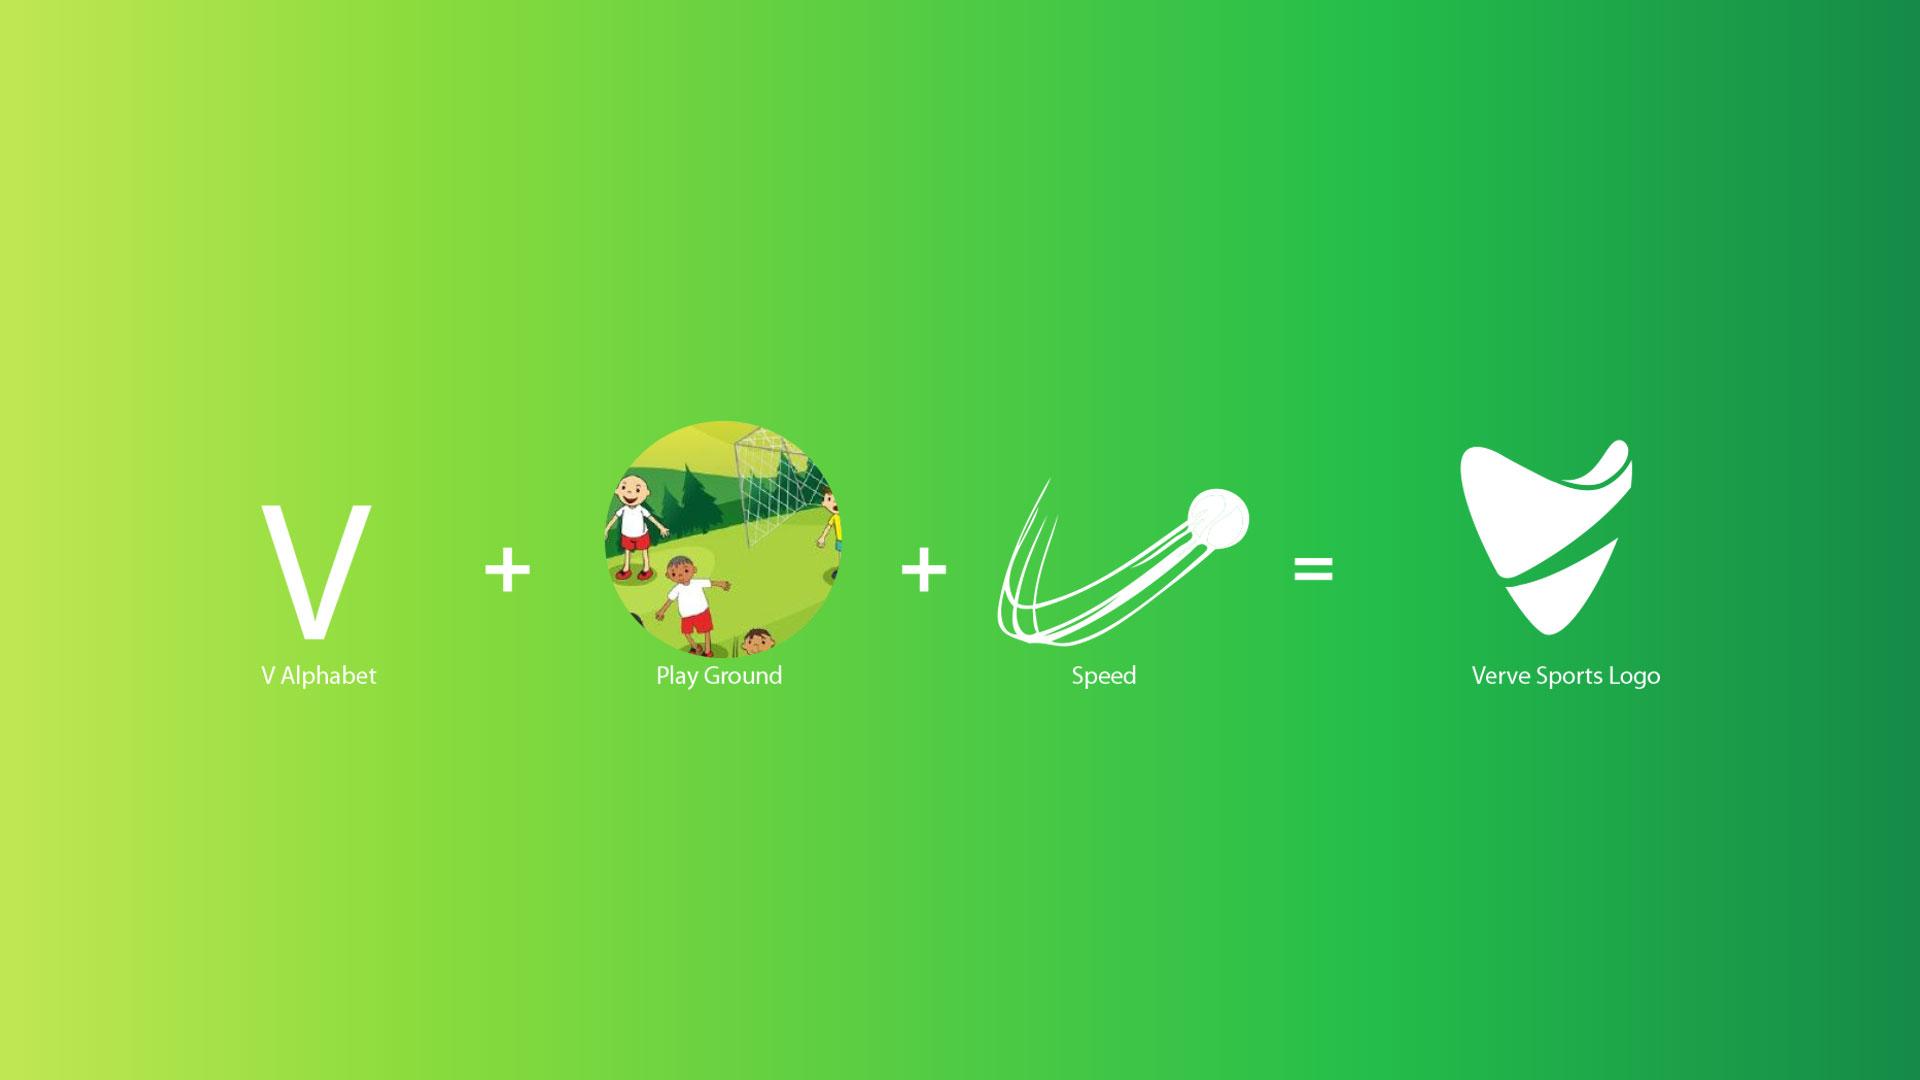 Verve Sports Logo Formation Presentation